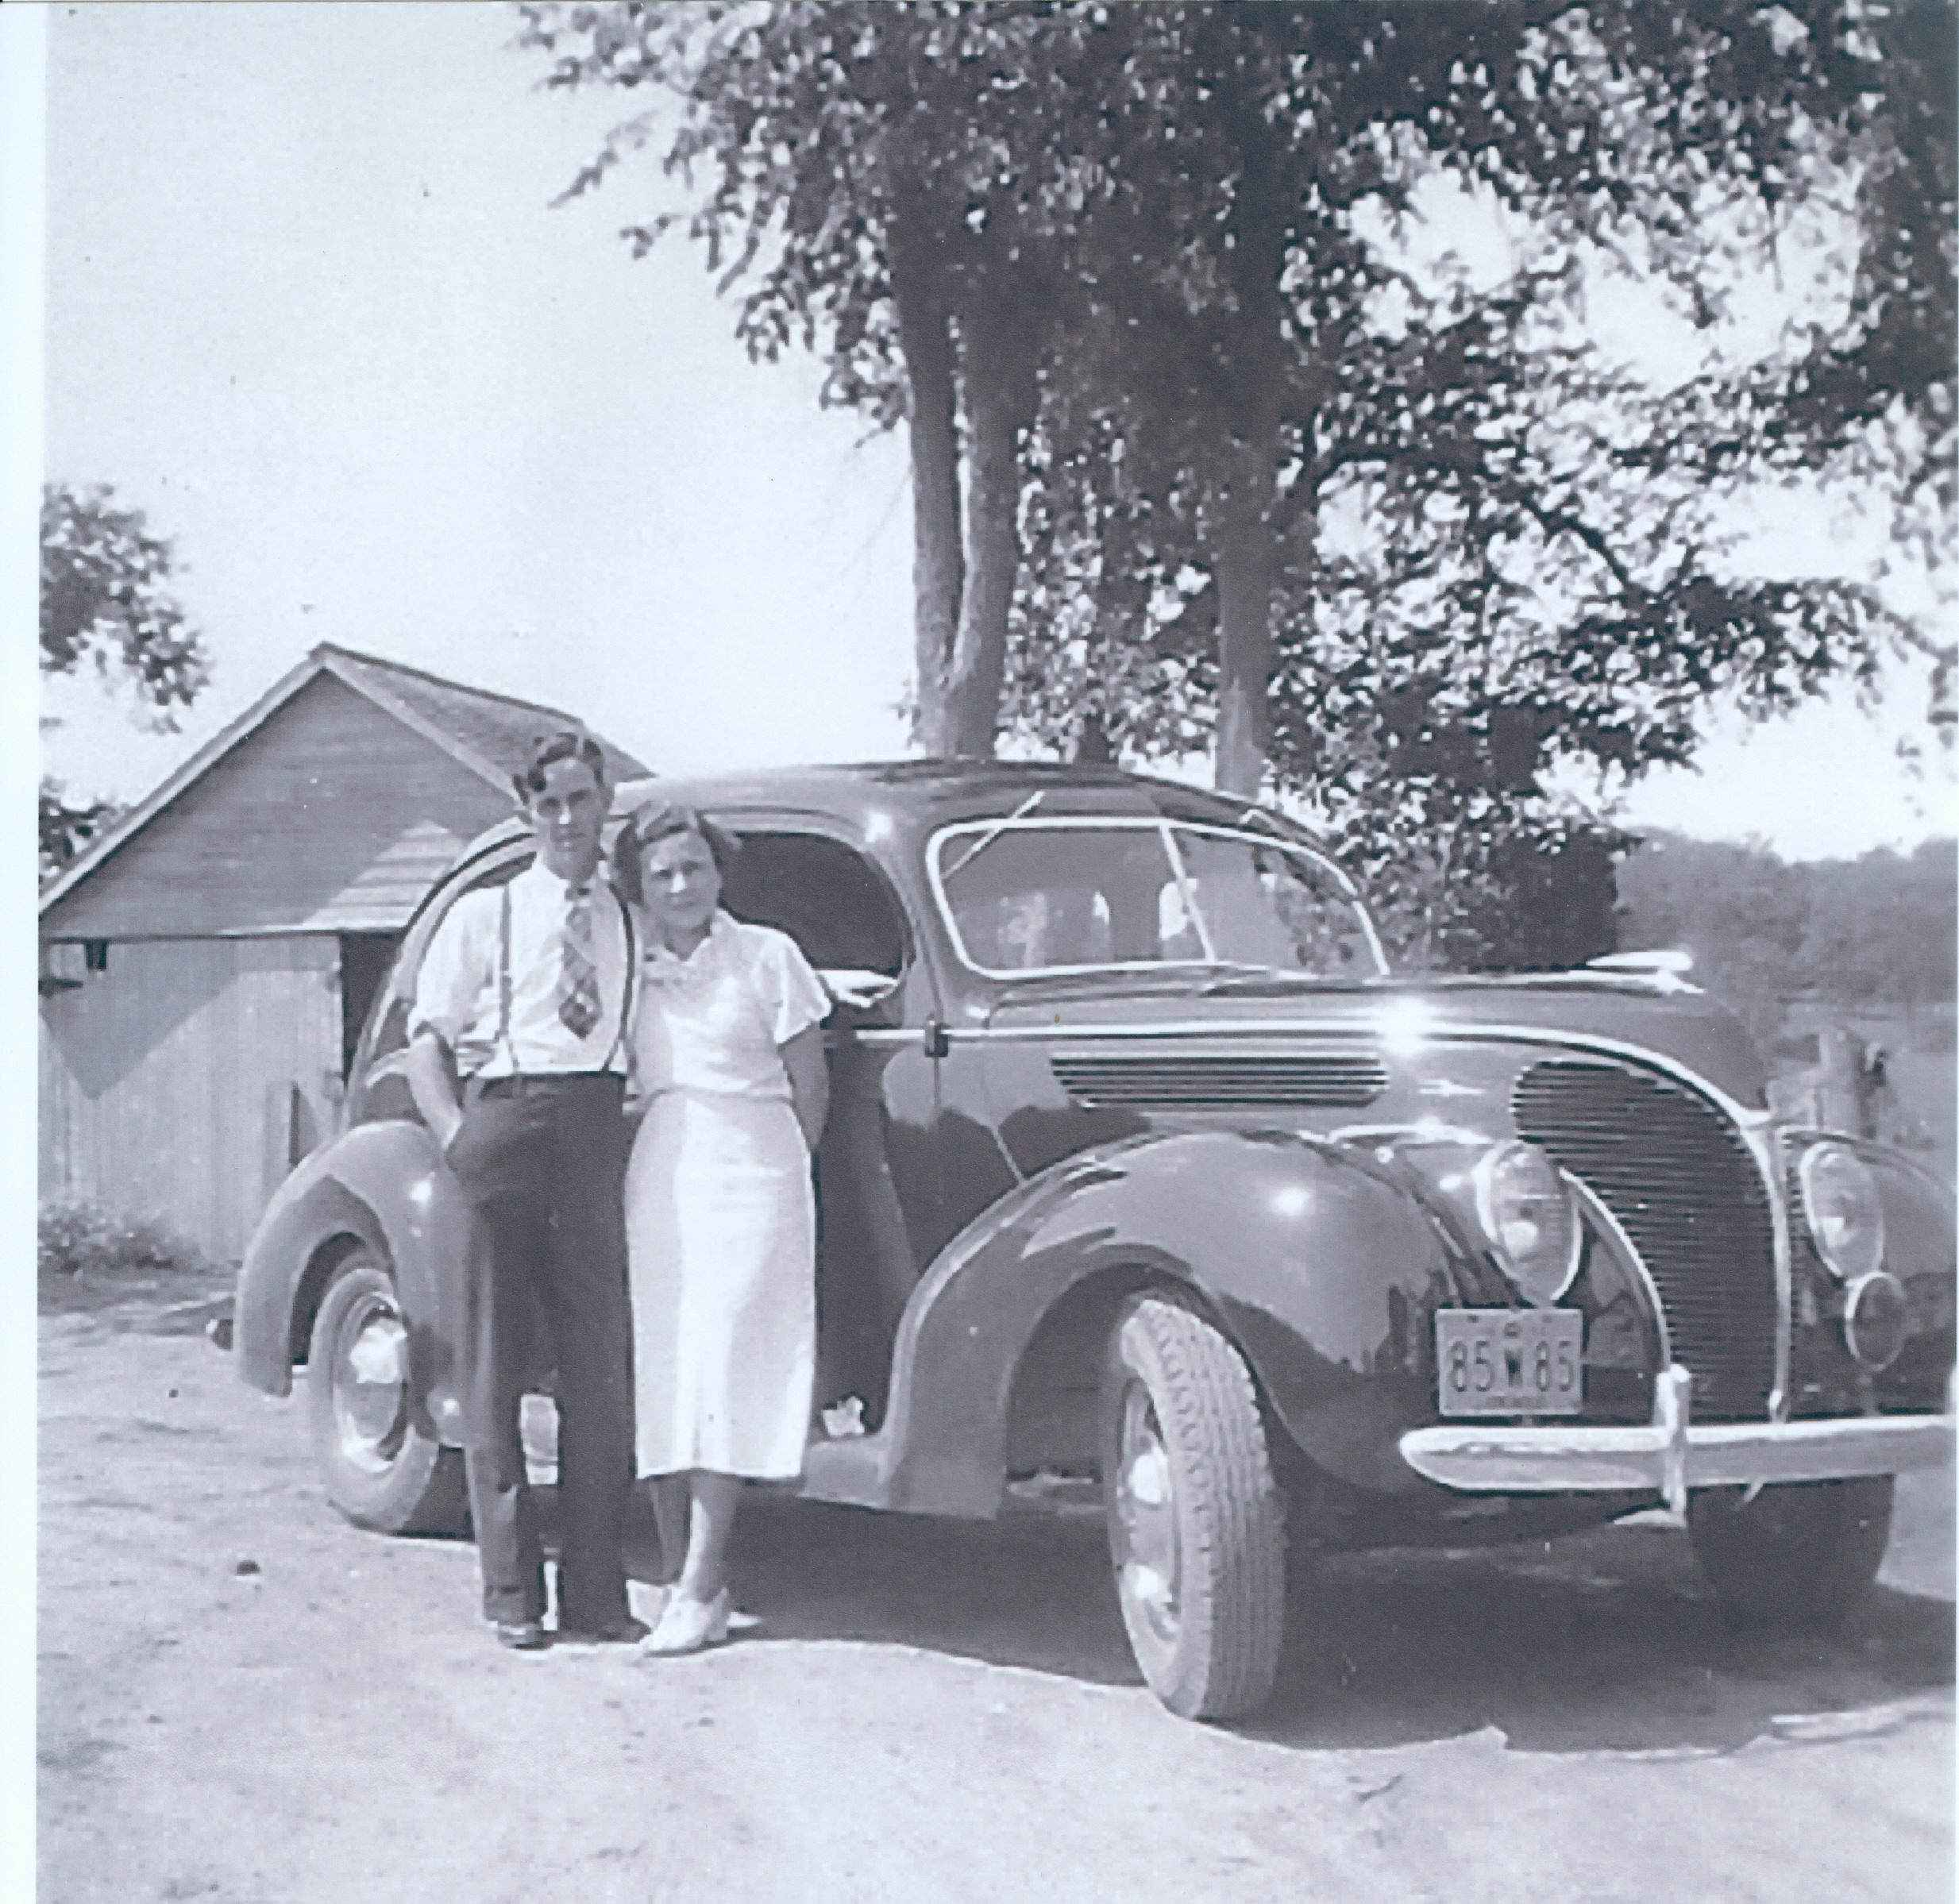 Cora and Harry Vansickle